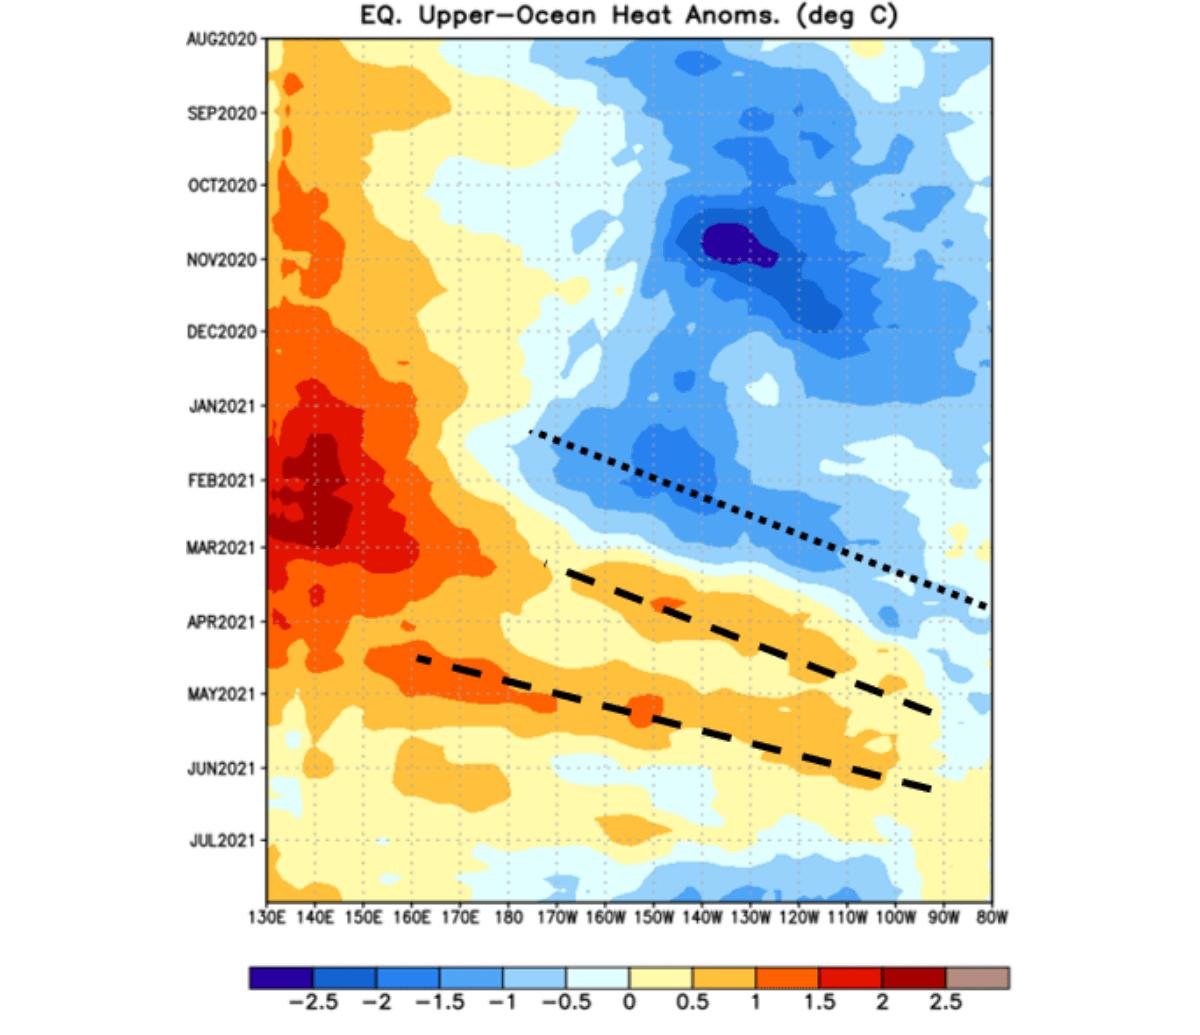 atlantic-hurricane-season-forecast-mjo-wave-storm-fred-kelvin-wave